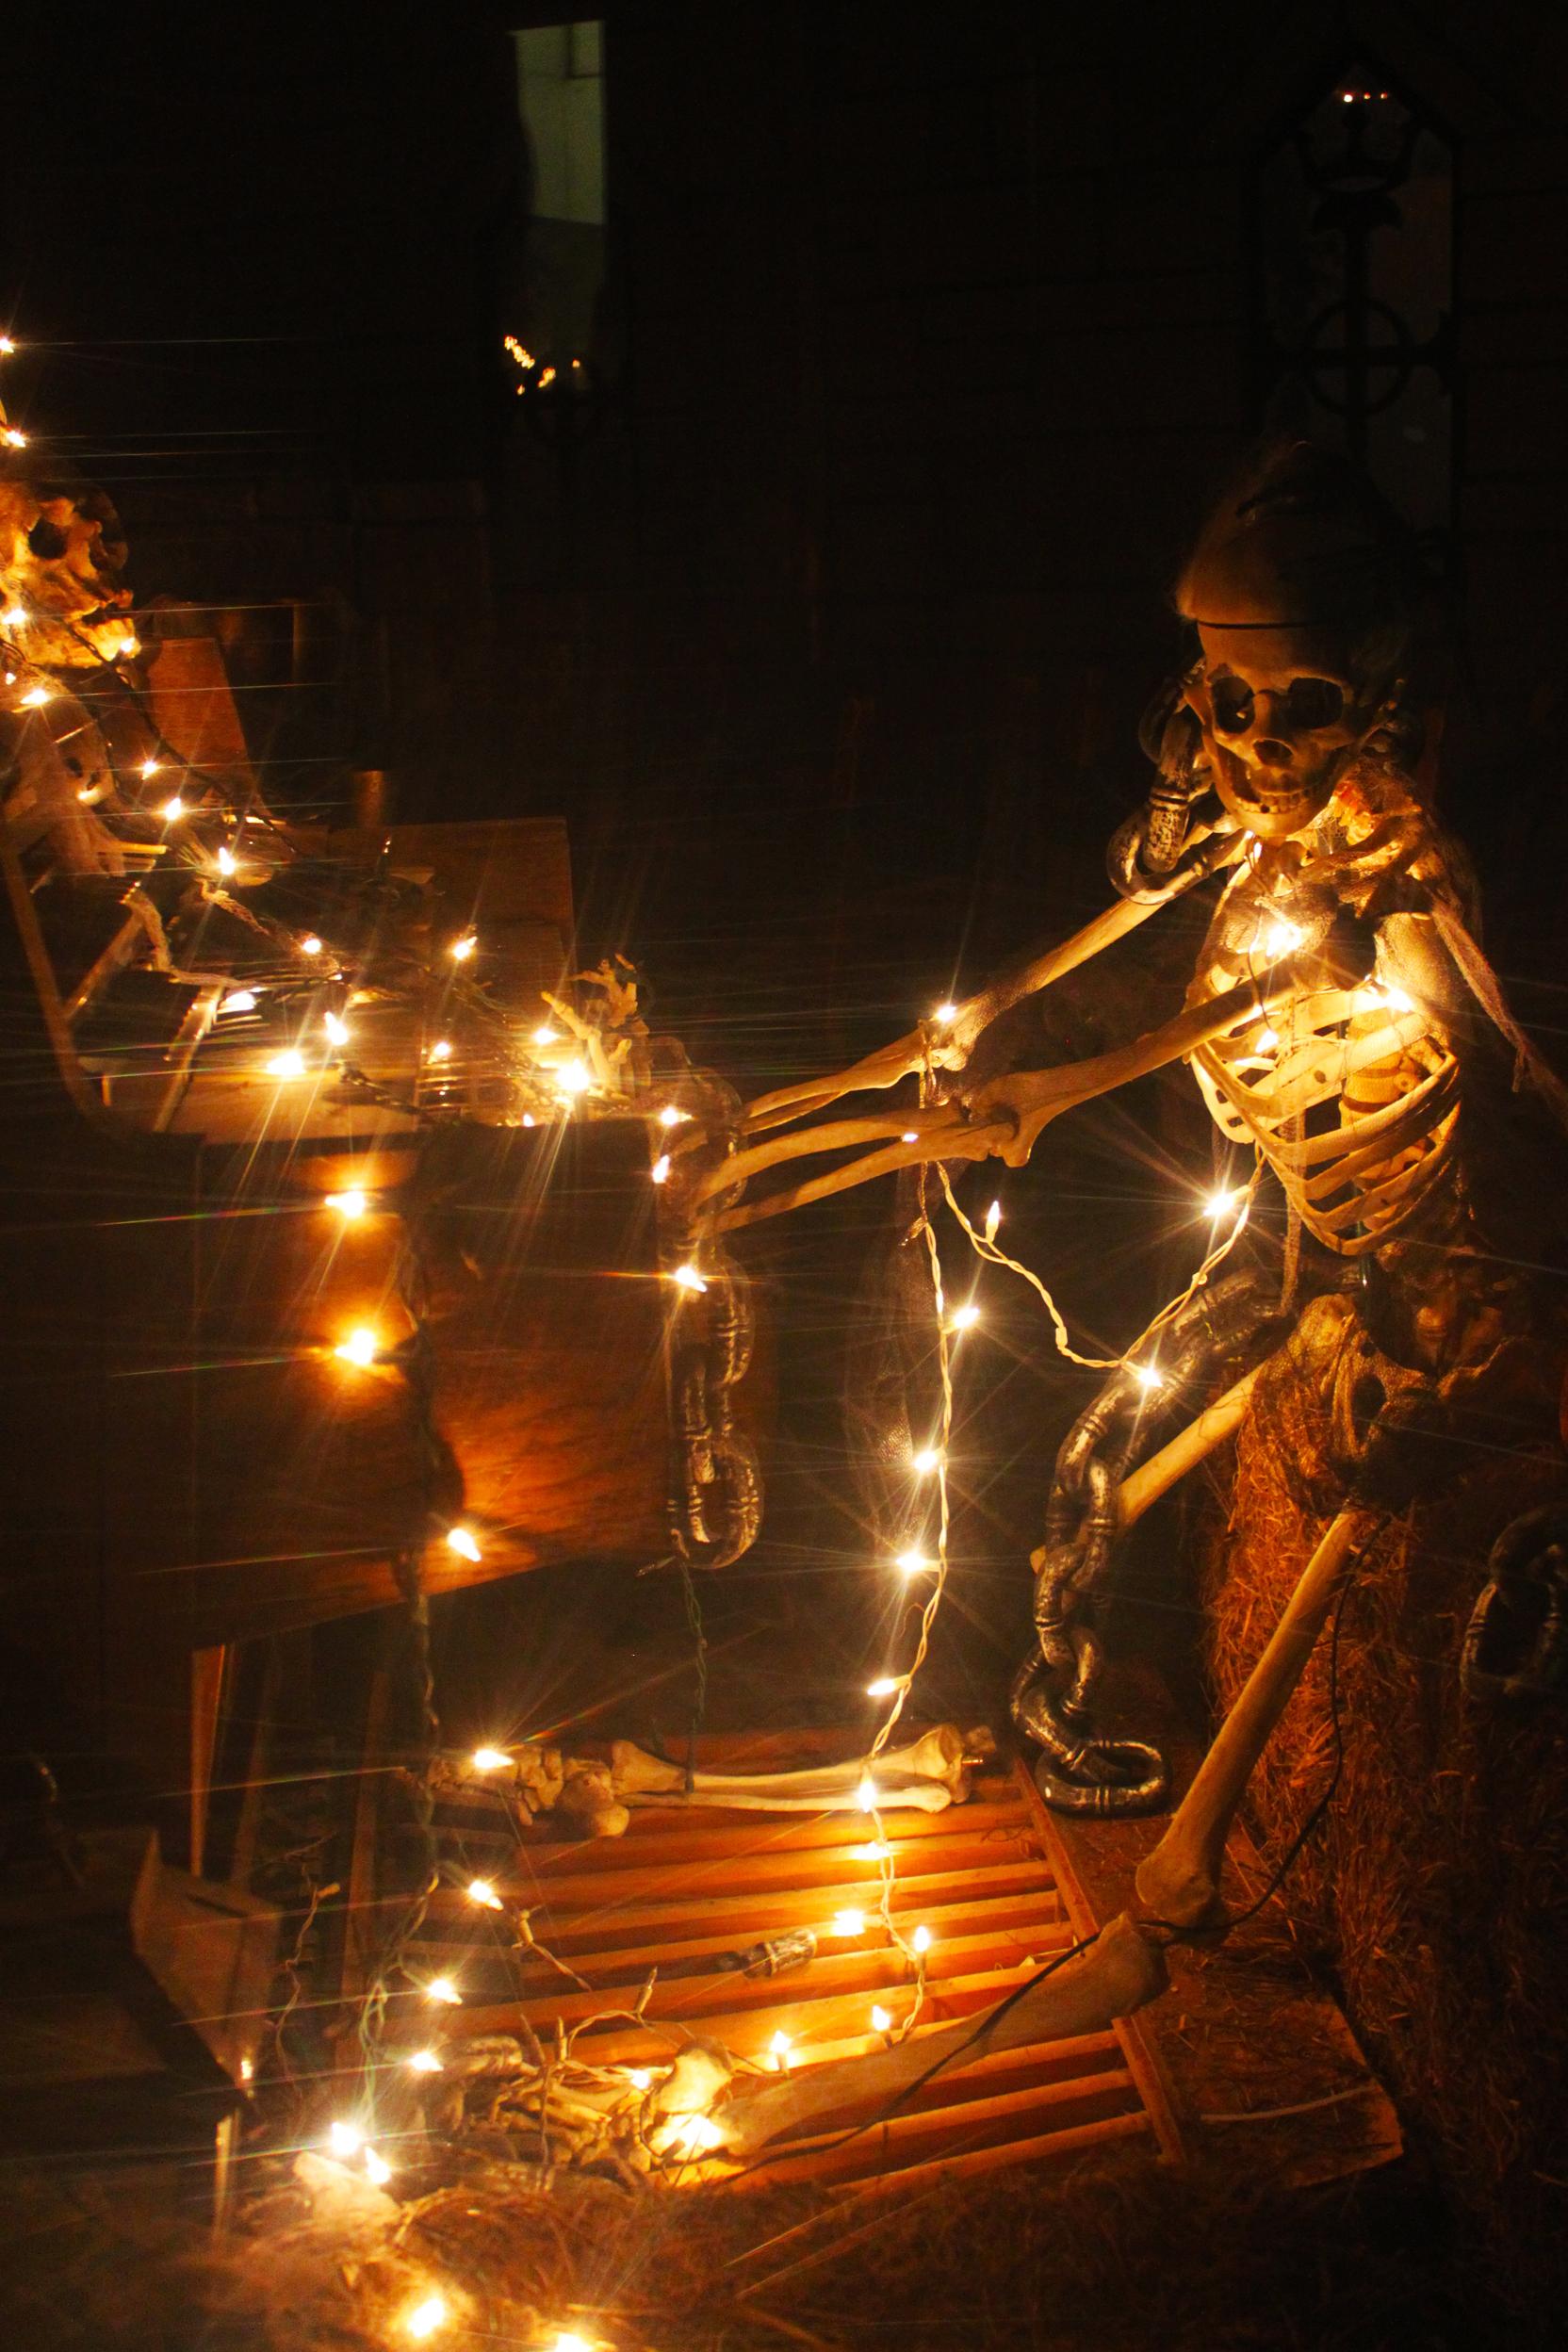 Halloween Decoration, Celebrate, Celebration, Decoration, Decorative, HQ Photo